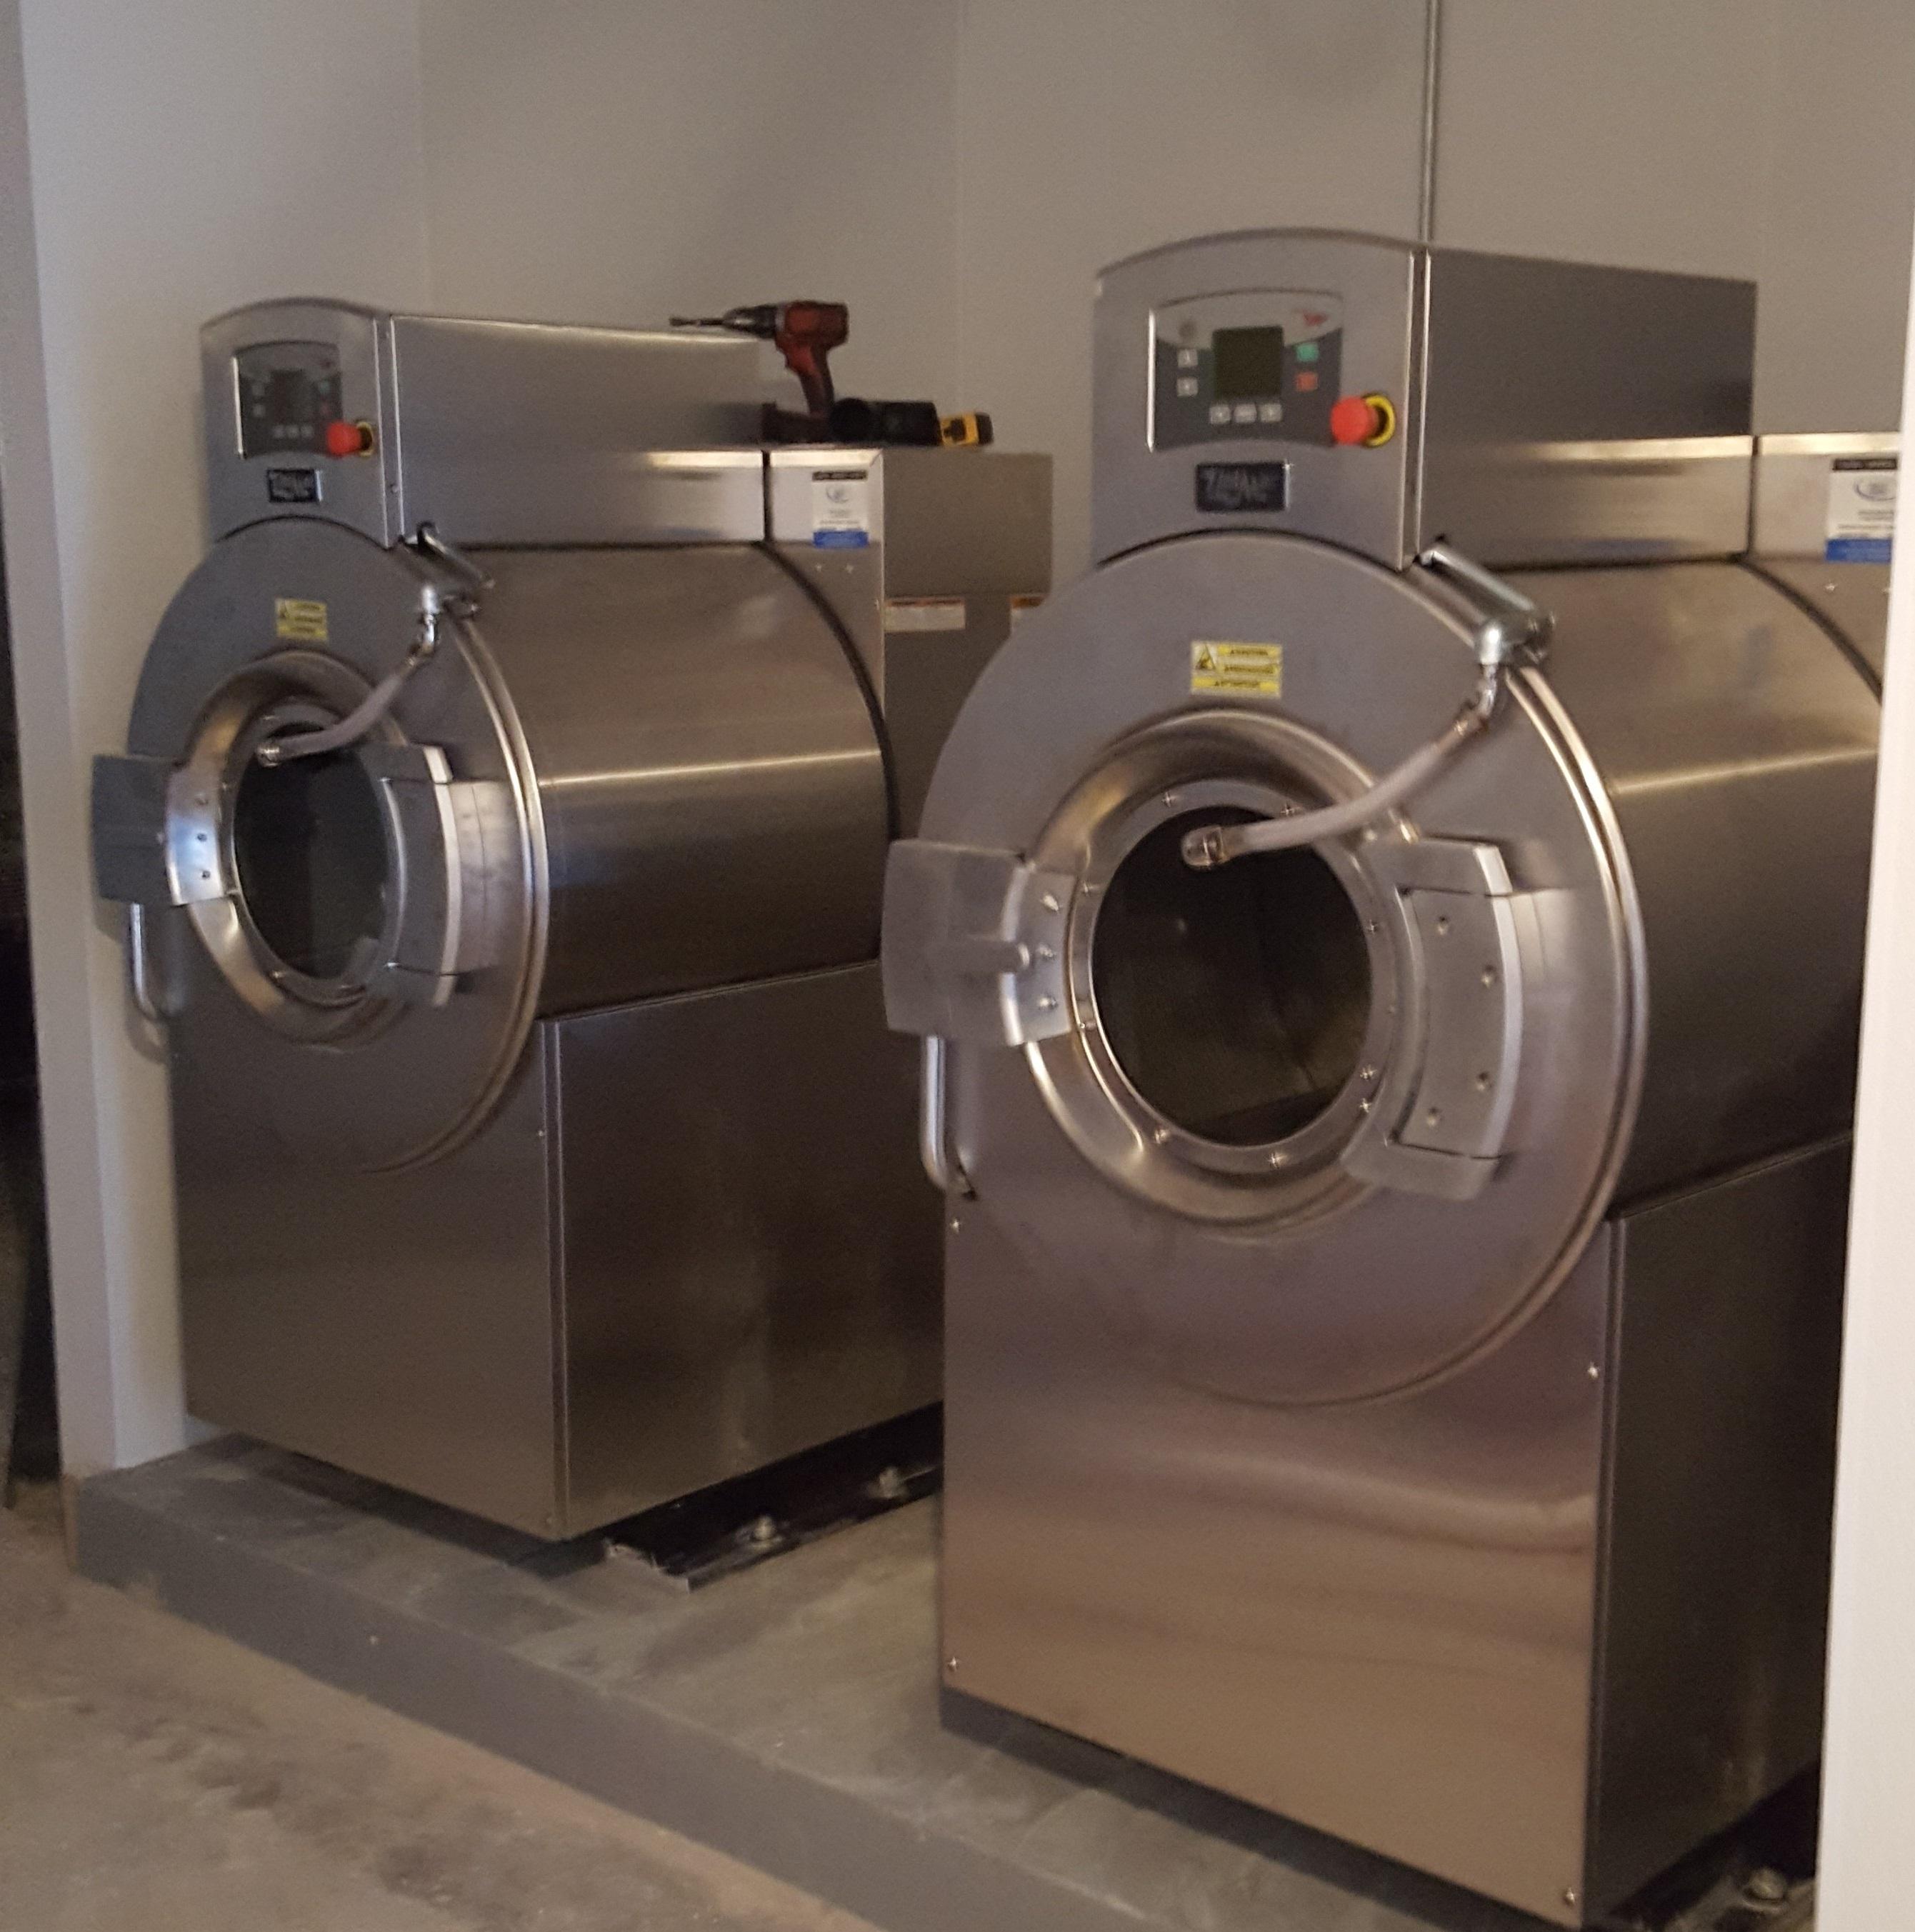 Commercial Laundry Equipment & Management   BDS Laundry